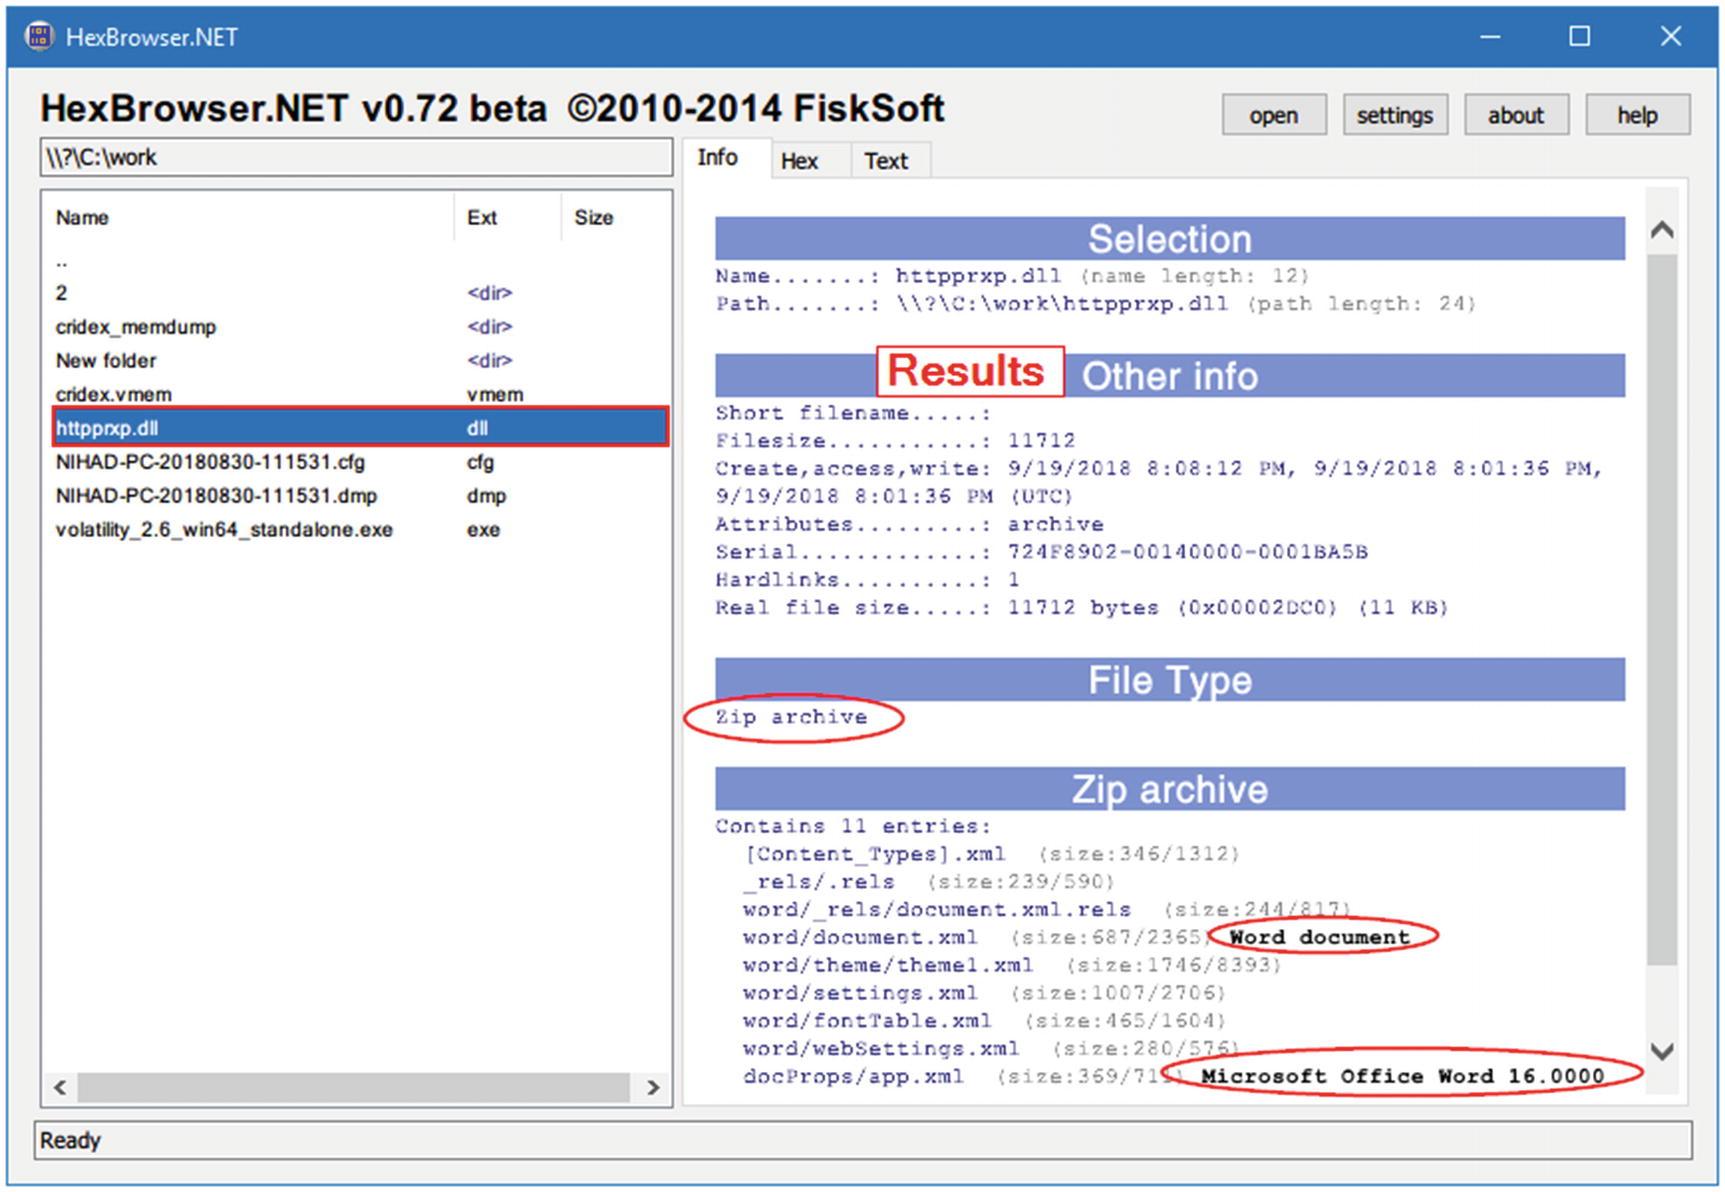 Windows Forensics Analysis Springerlink